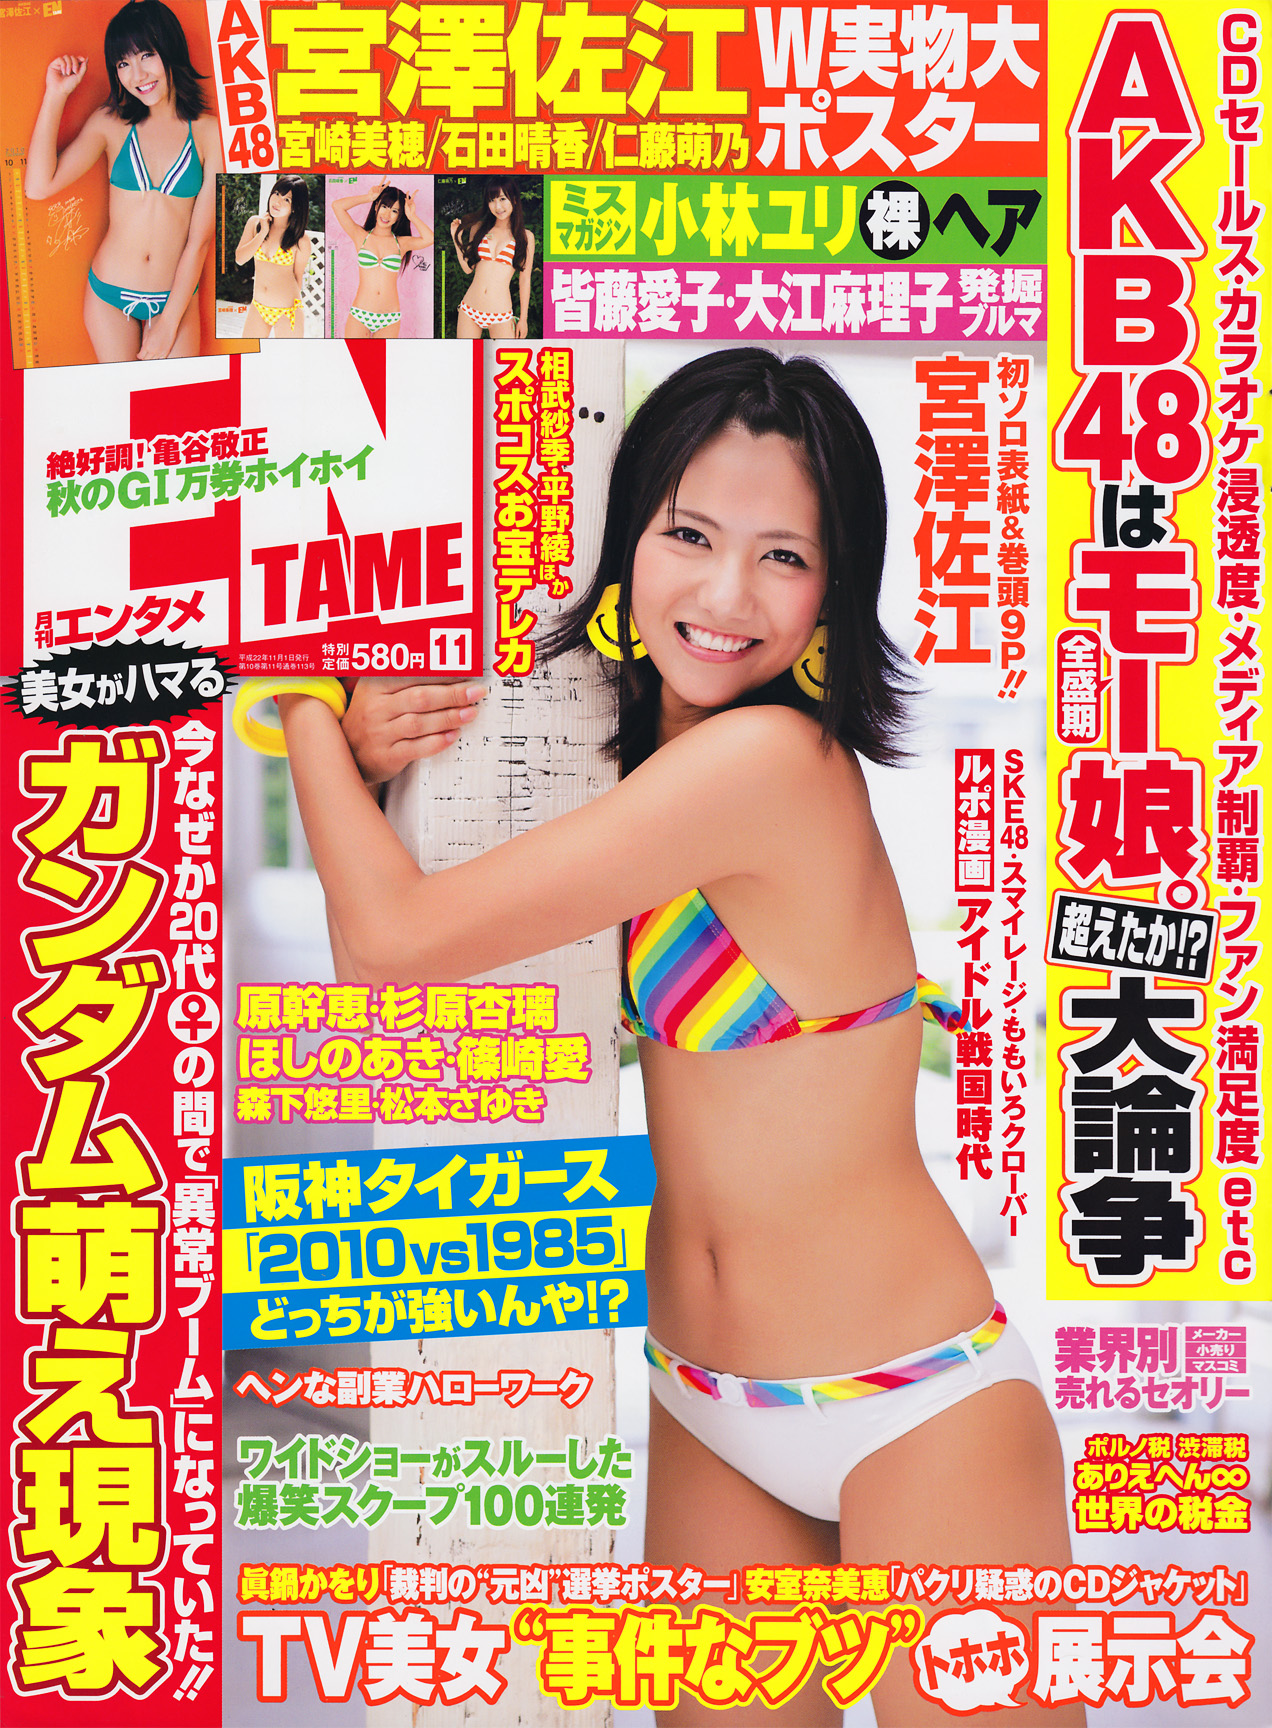 ENTAME 2010 No.11 (AKB48: Sae miyasawa, Nito Moena, Miho Miyasaki, Haruka)